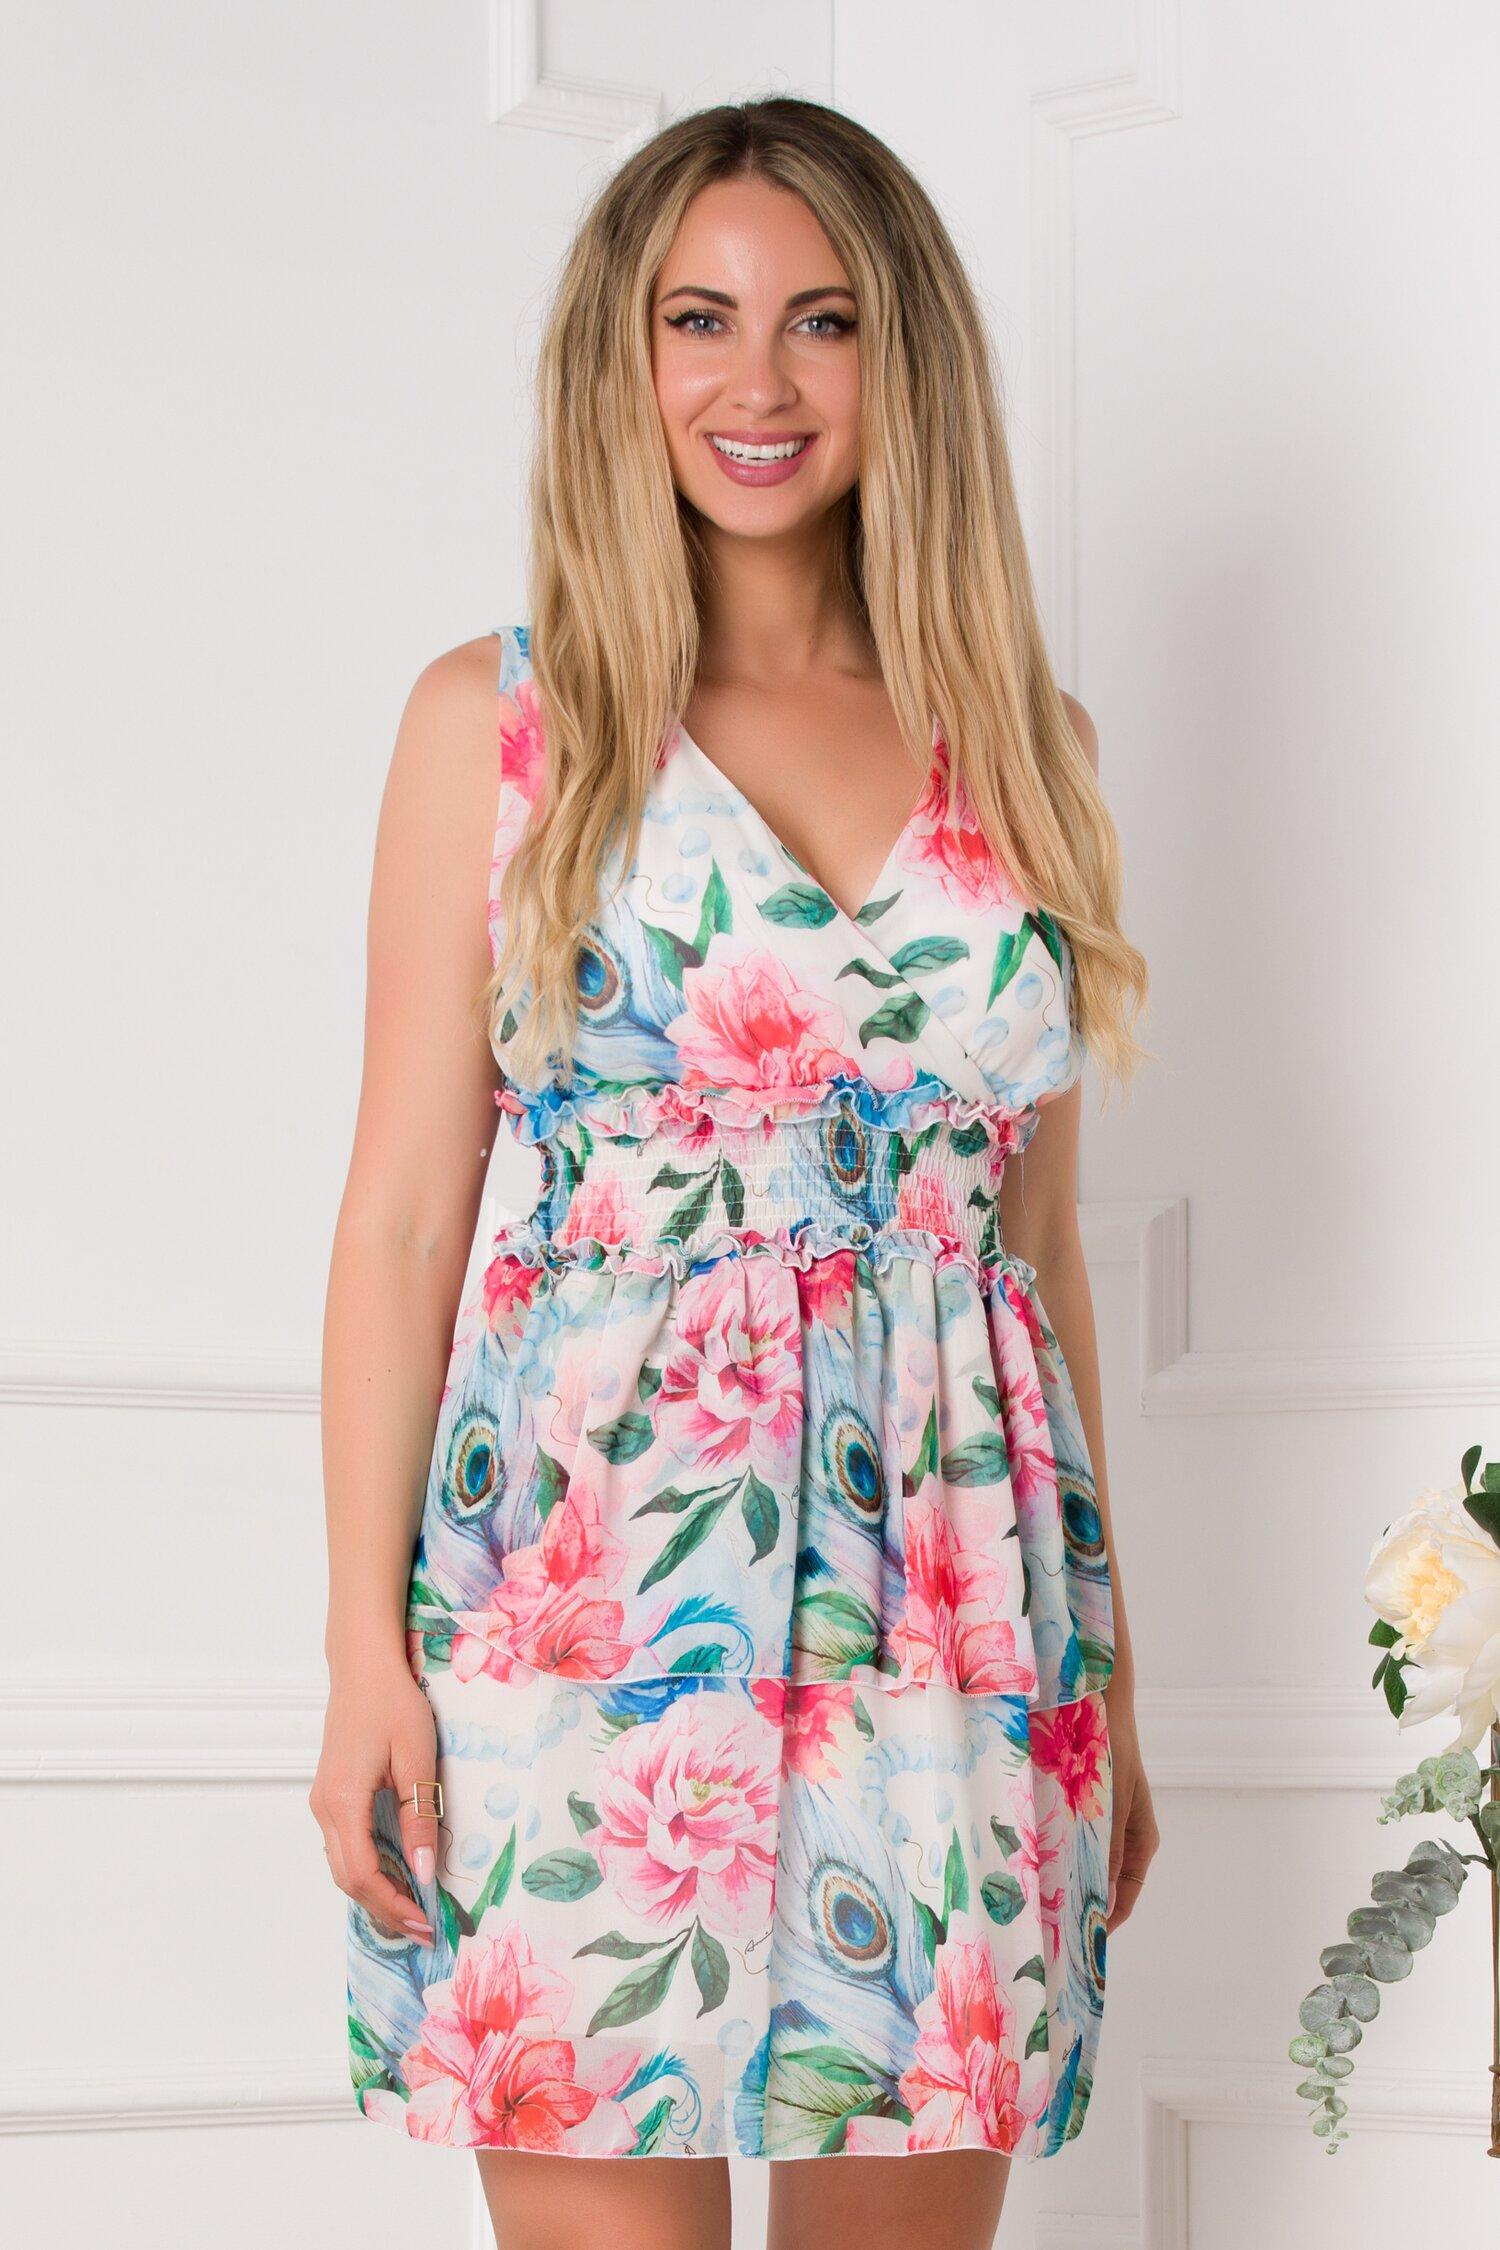 rochie dollie ivoire cu imprimeu floral in nuante de albastru si roz 531357 4